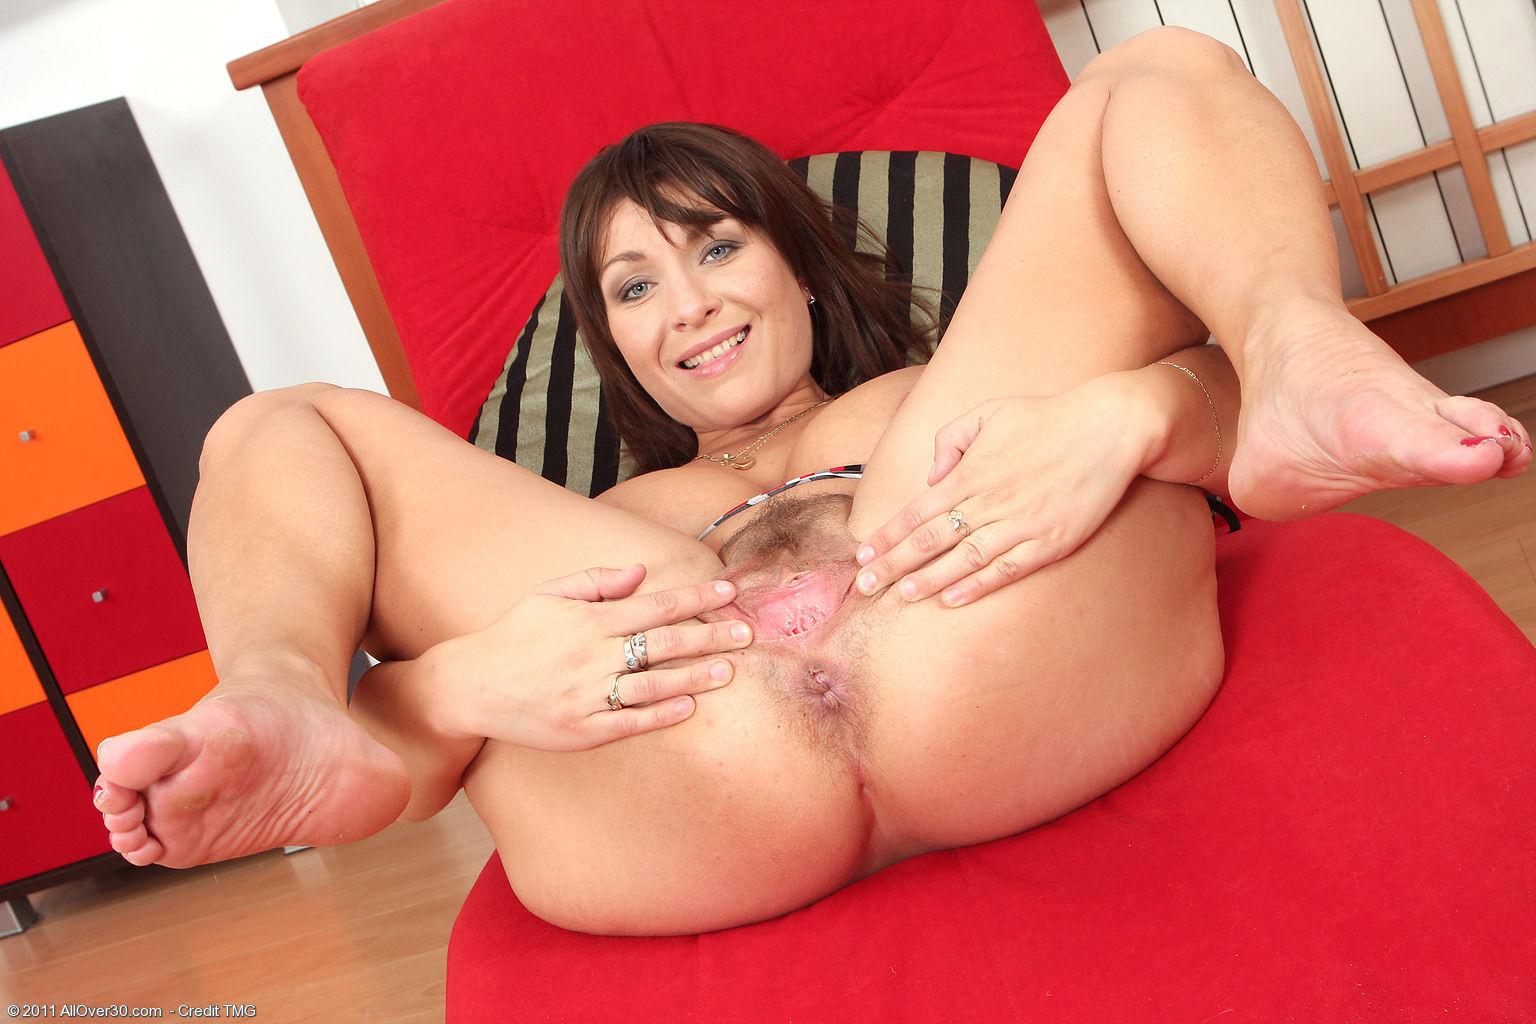 Pic amazonwomanporn pics nude vids